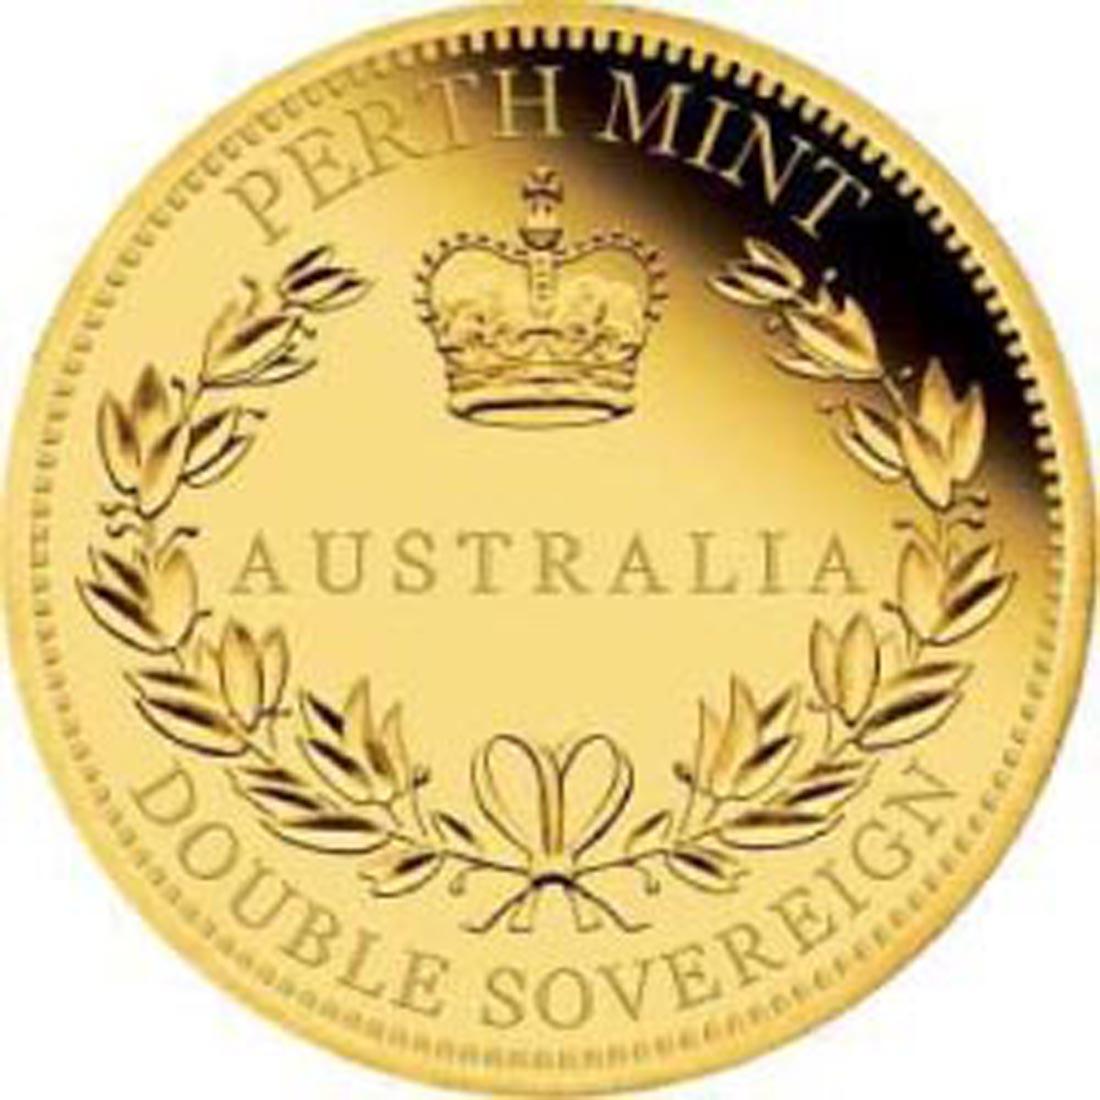 Lieferumfang:Australien : 50 Dollar Australischer Double Sovereign  2018 PP